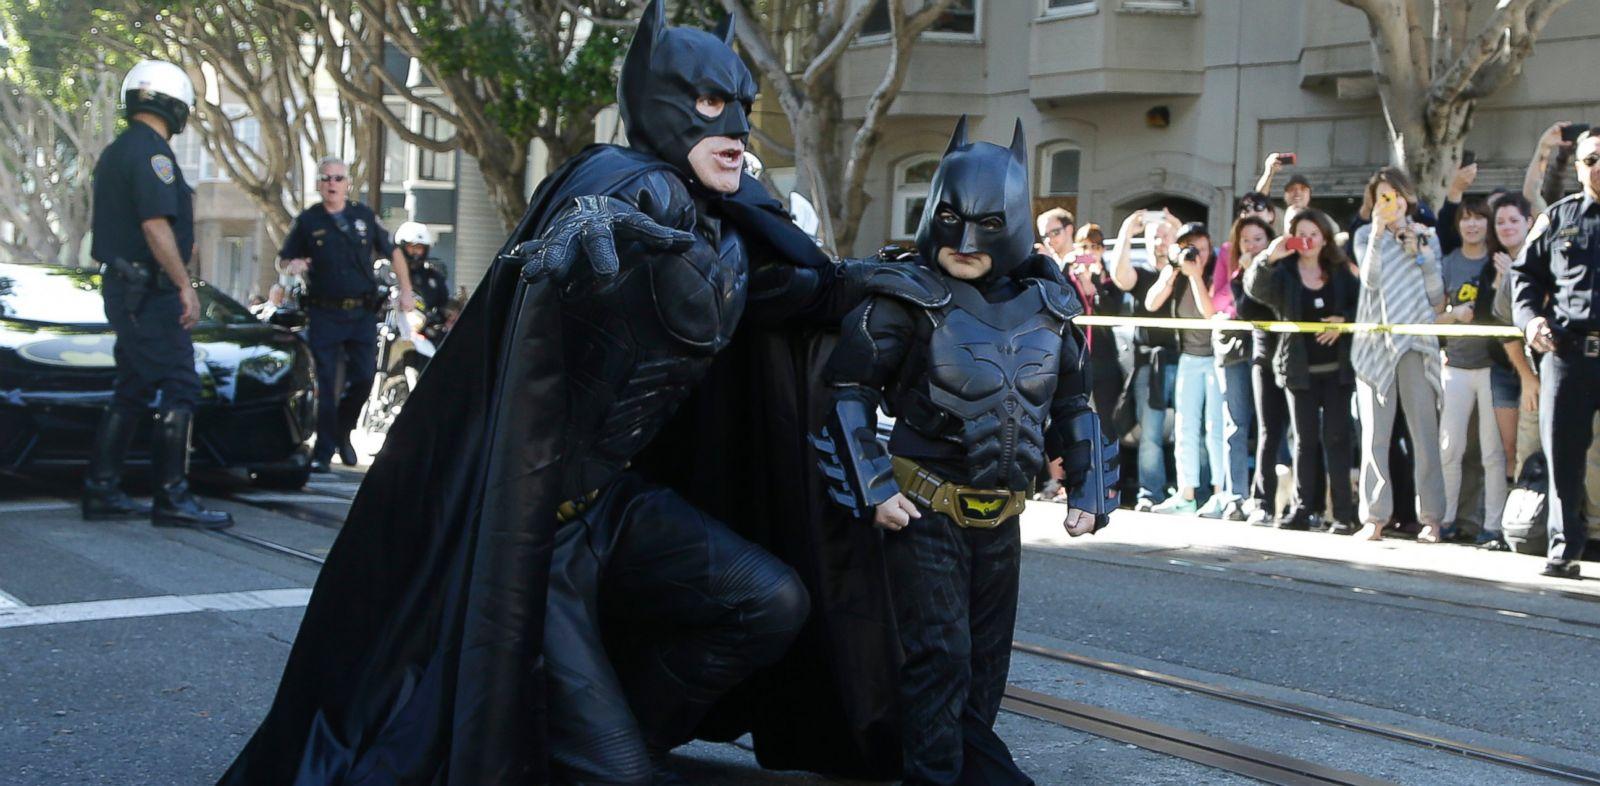 PHOTO: Miles Scott, dressed as Batkid, right, walks with Batman before saving a damsel in distress in San Francisco, Nov. 15, 2013.